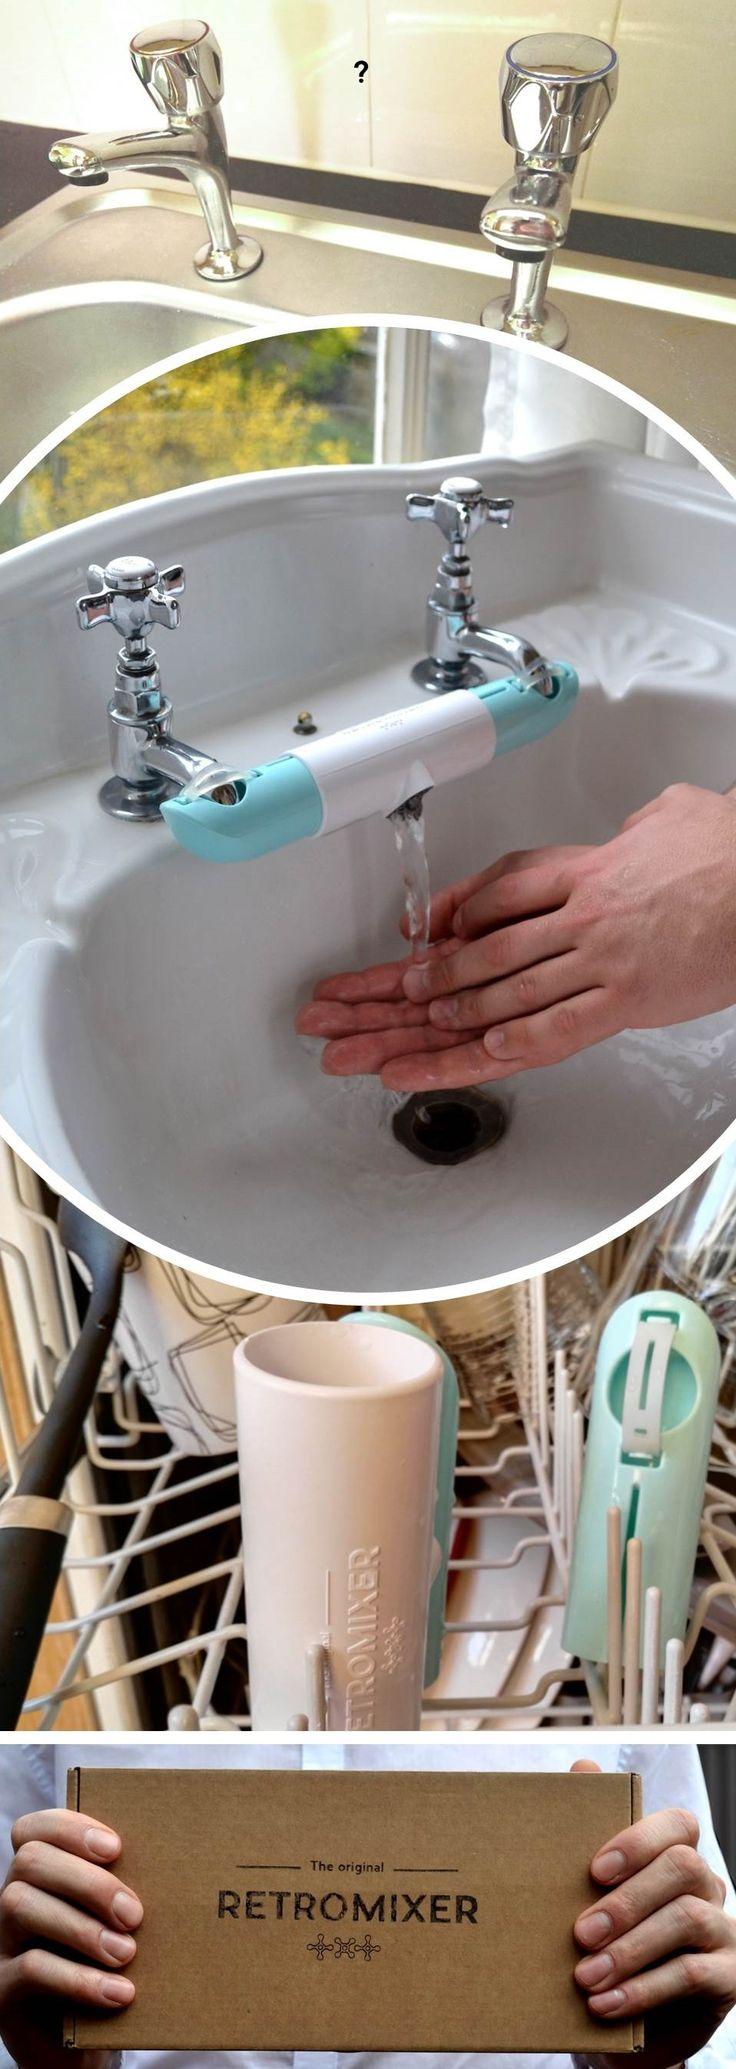 Bathroom tap connector for British sinks / basins